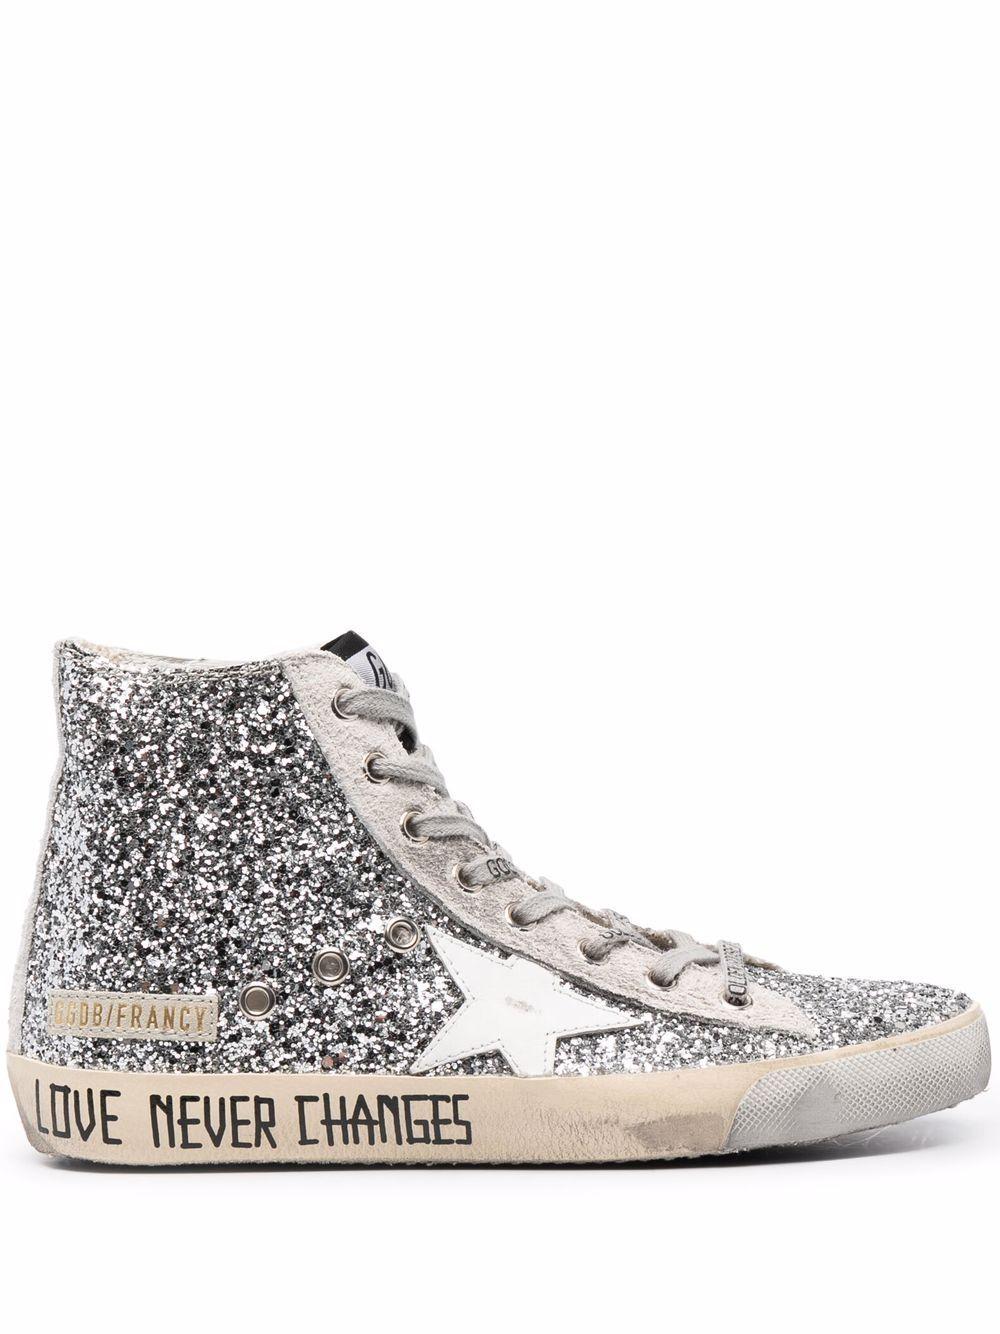 Picture of Golden Goose Deluxe Brand | Francy High-Top Sneakers